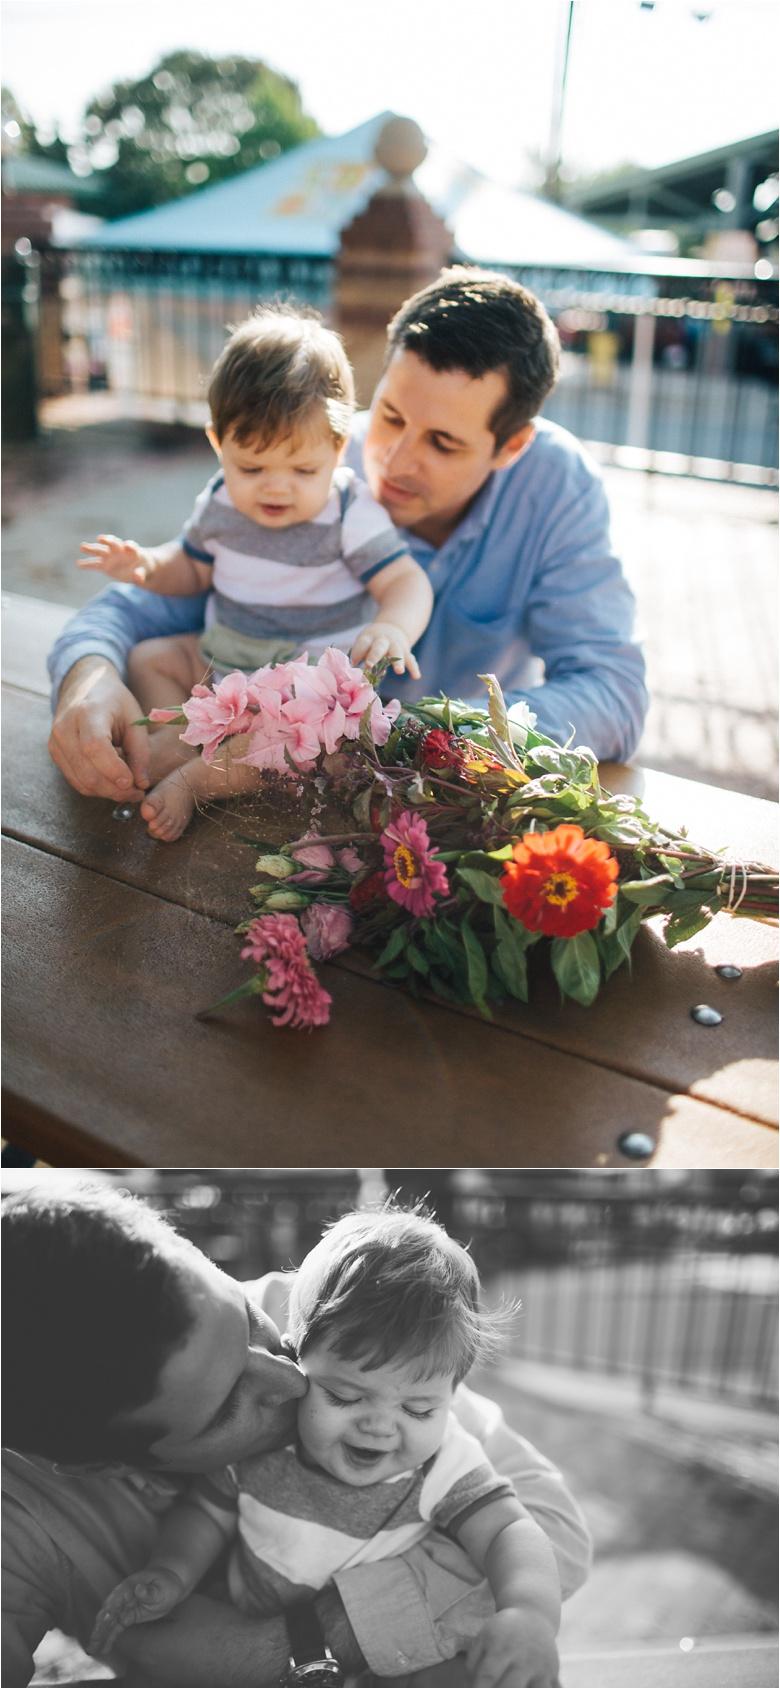 kansascityfamilyphotographer_0052